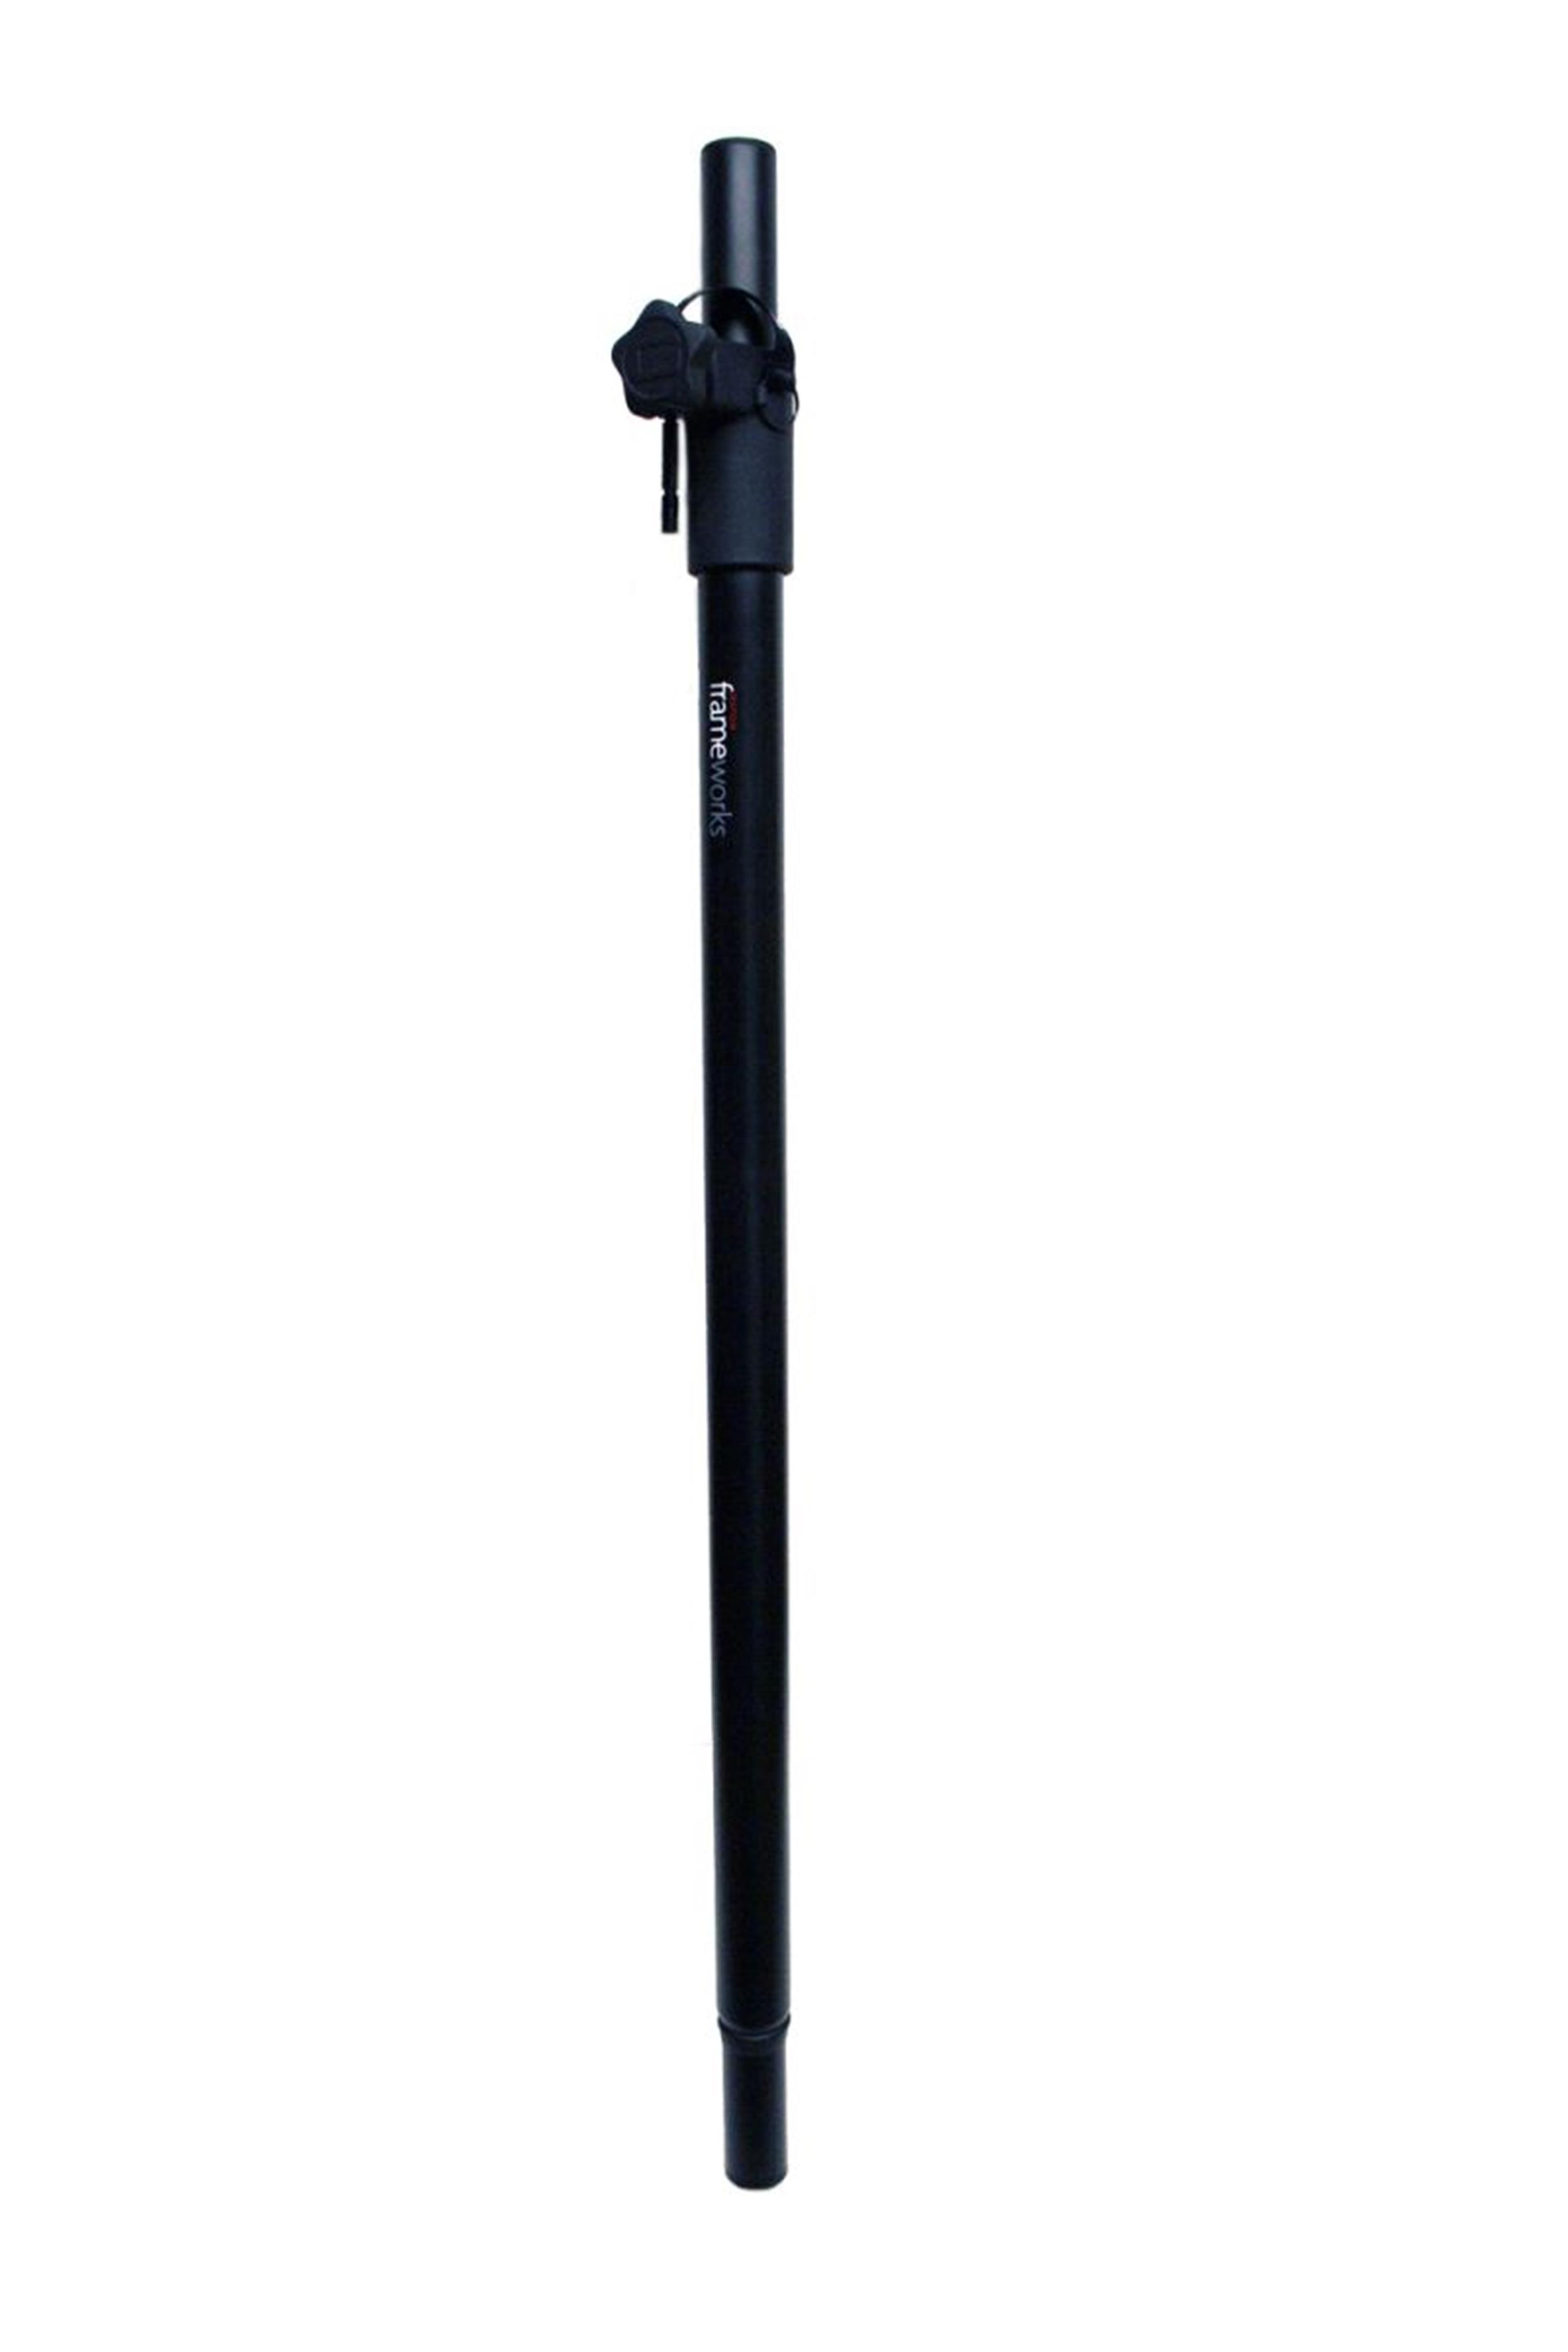 Gator GFW-SPK-SUB60 - asta sub regolabile